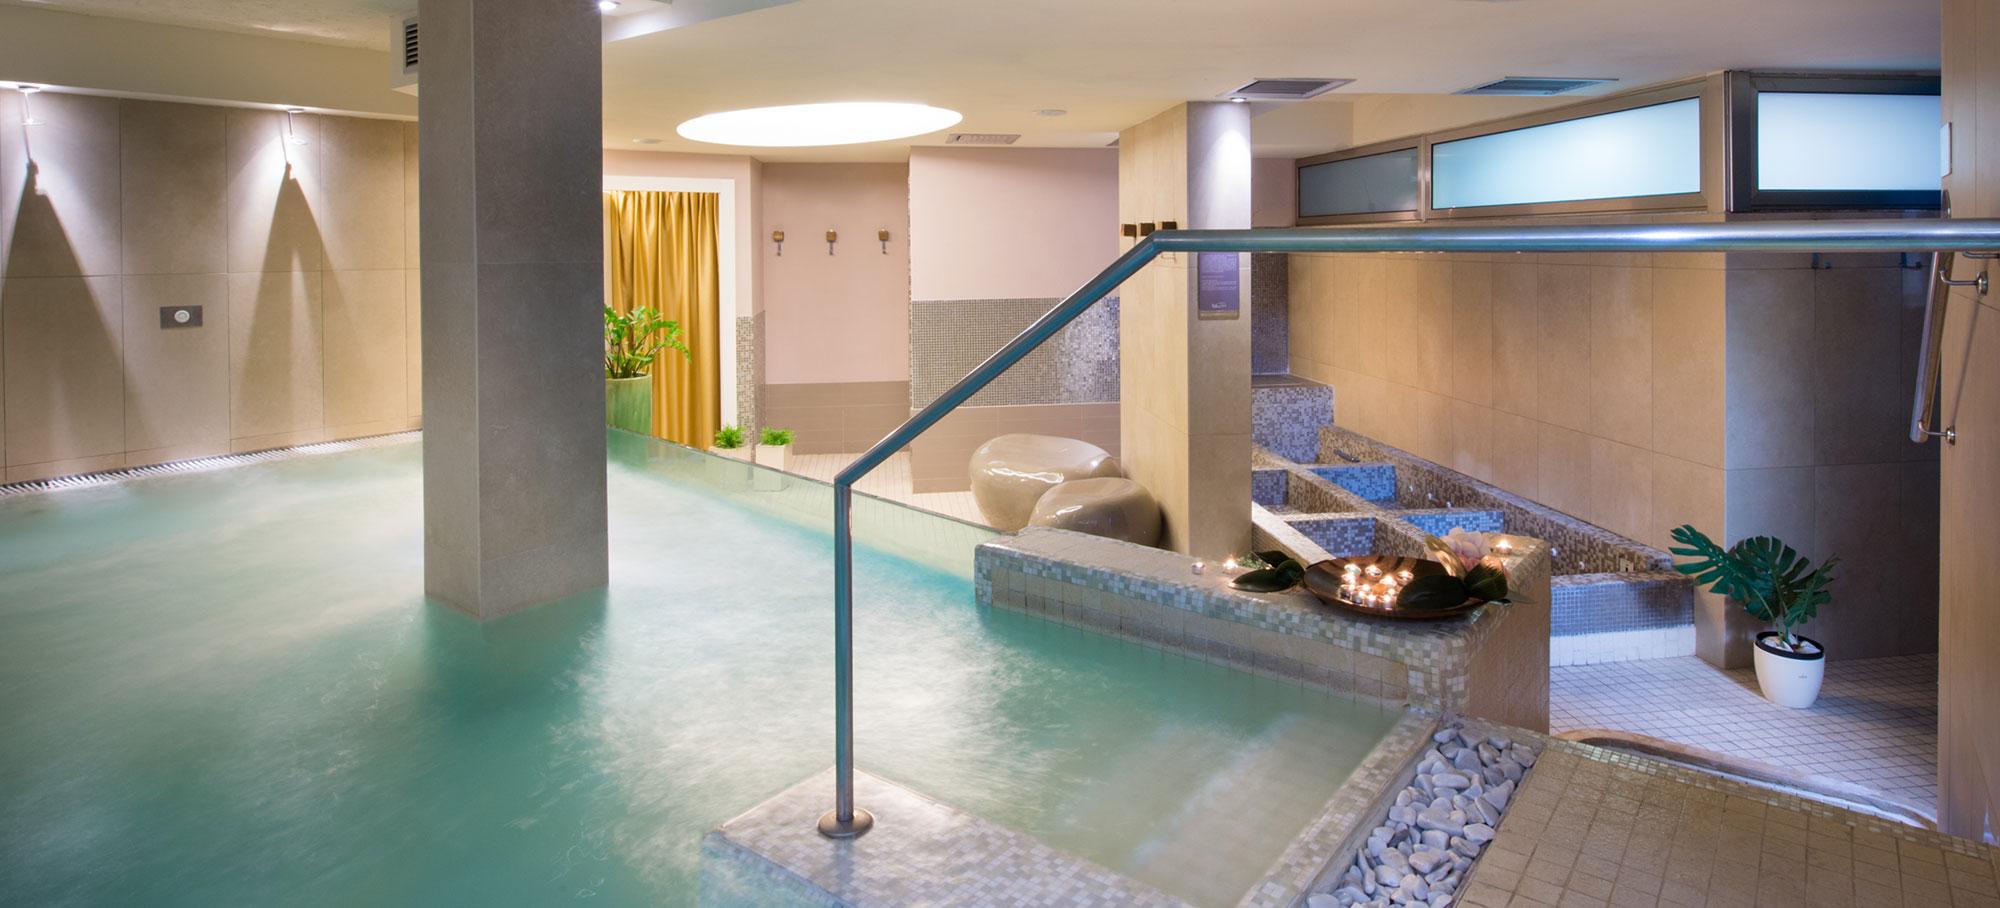 Blu suite hotel 4 sterne bellaria igea marina for Aussenpool aufblasbar